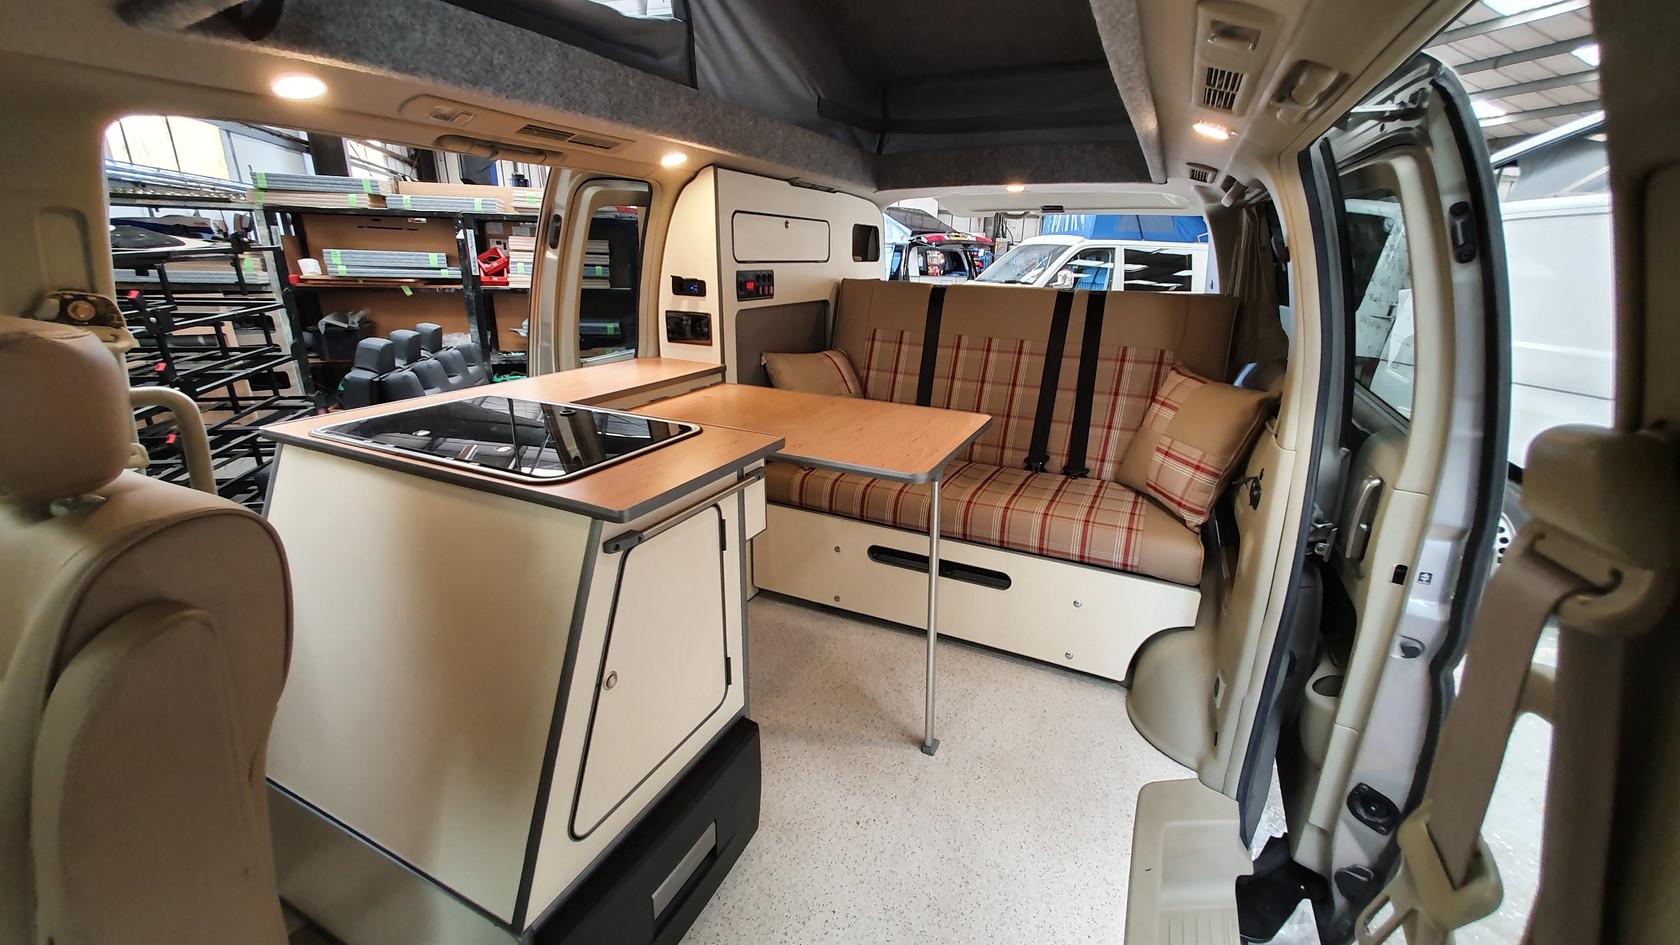 HW52 KFR- Nissan Elgrand - Skye- Roof an